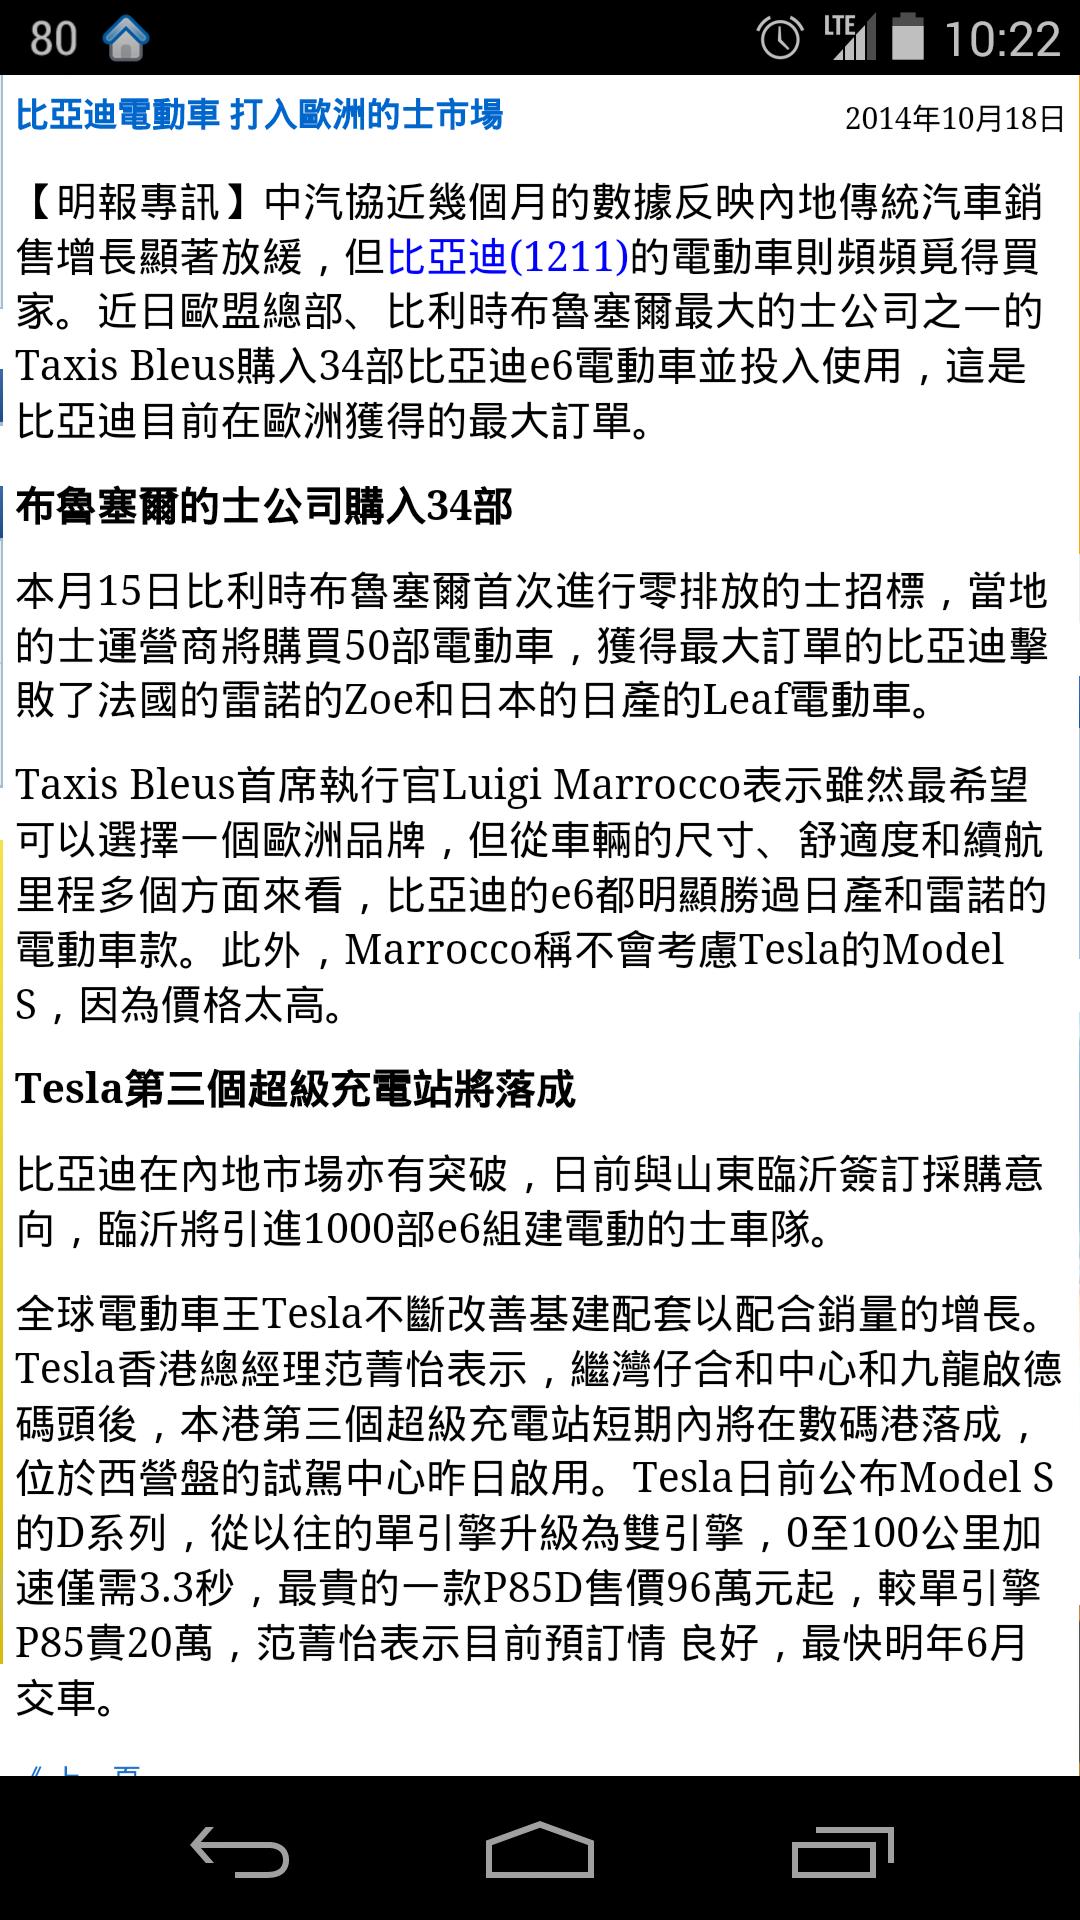 Screenshot_2014-10-18-10-22-38.png